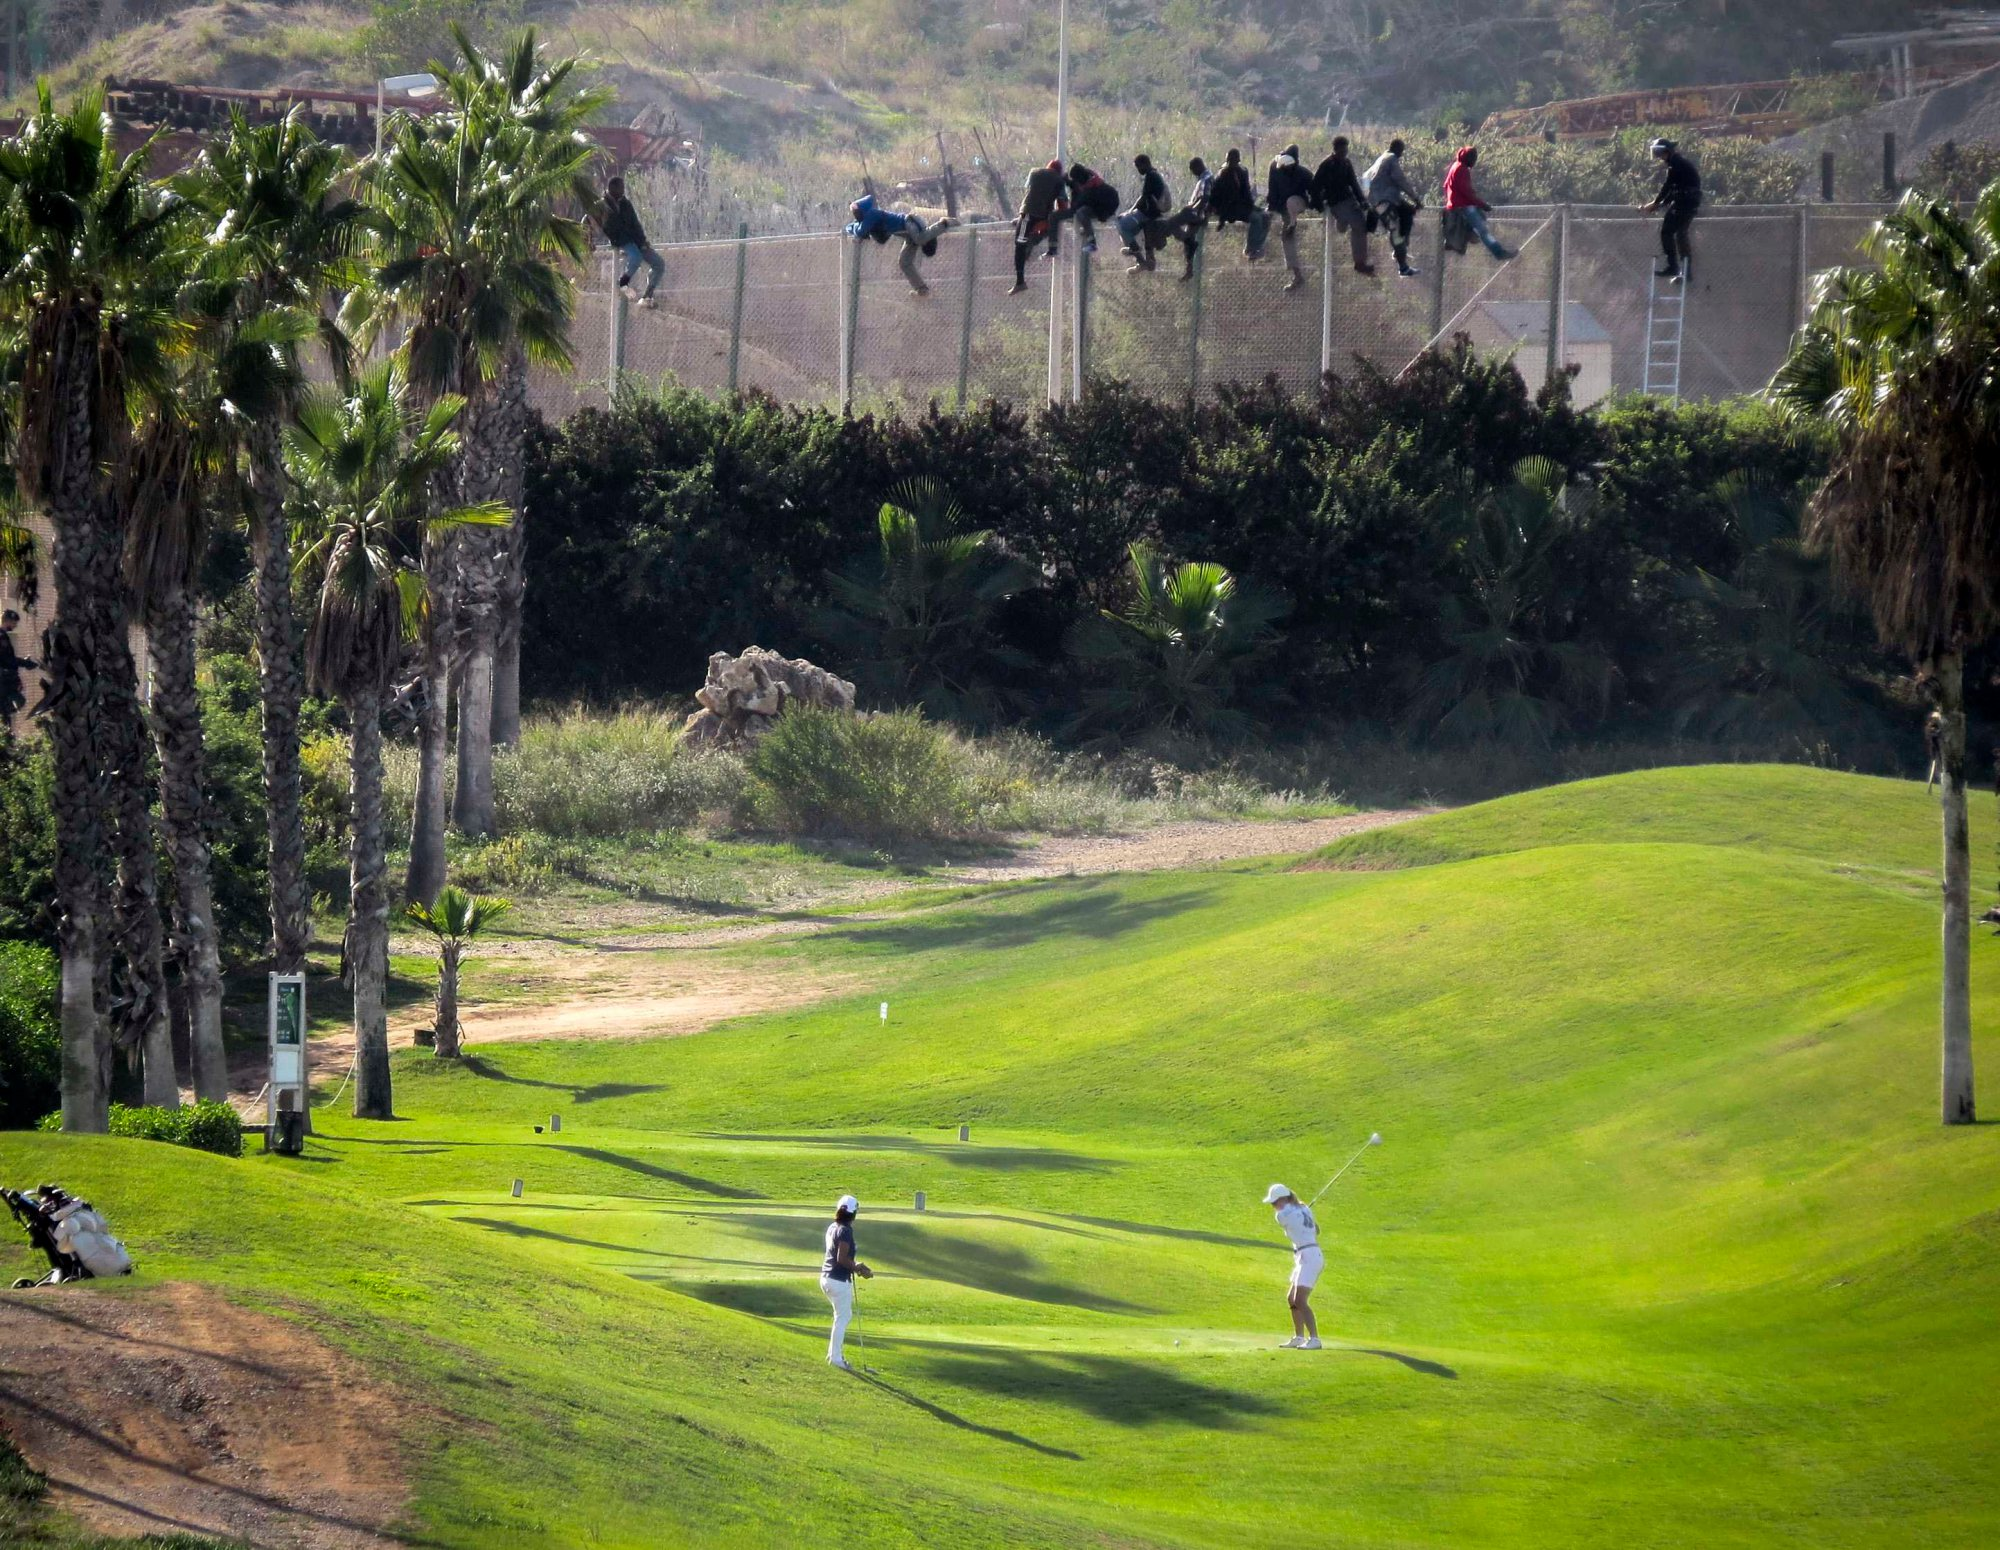 Spain Visits its Enclaves